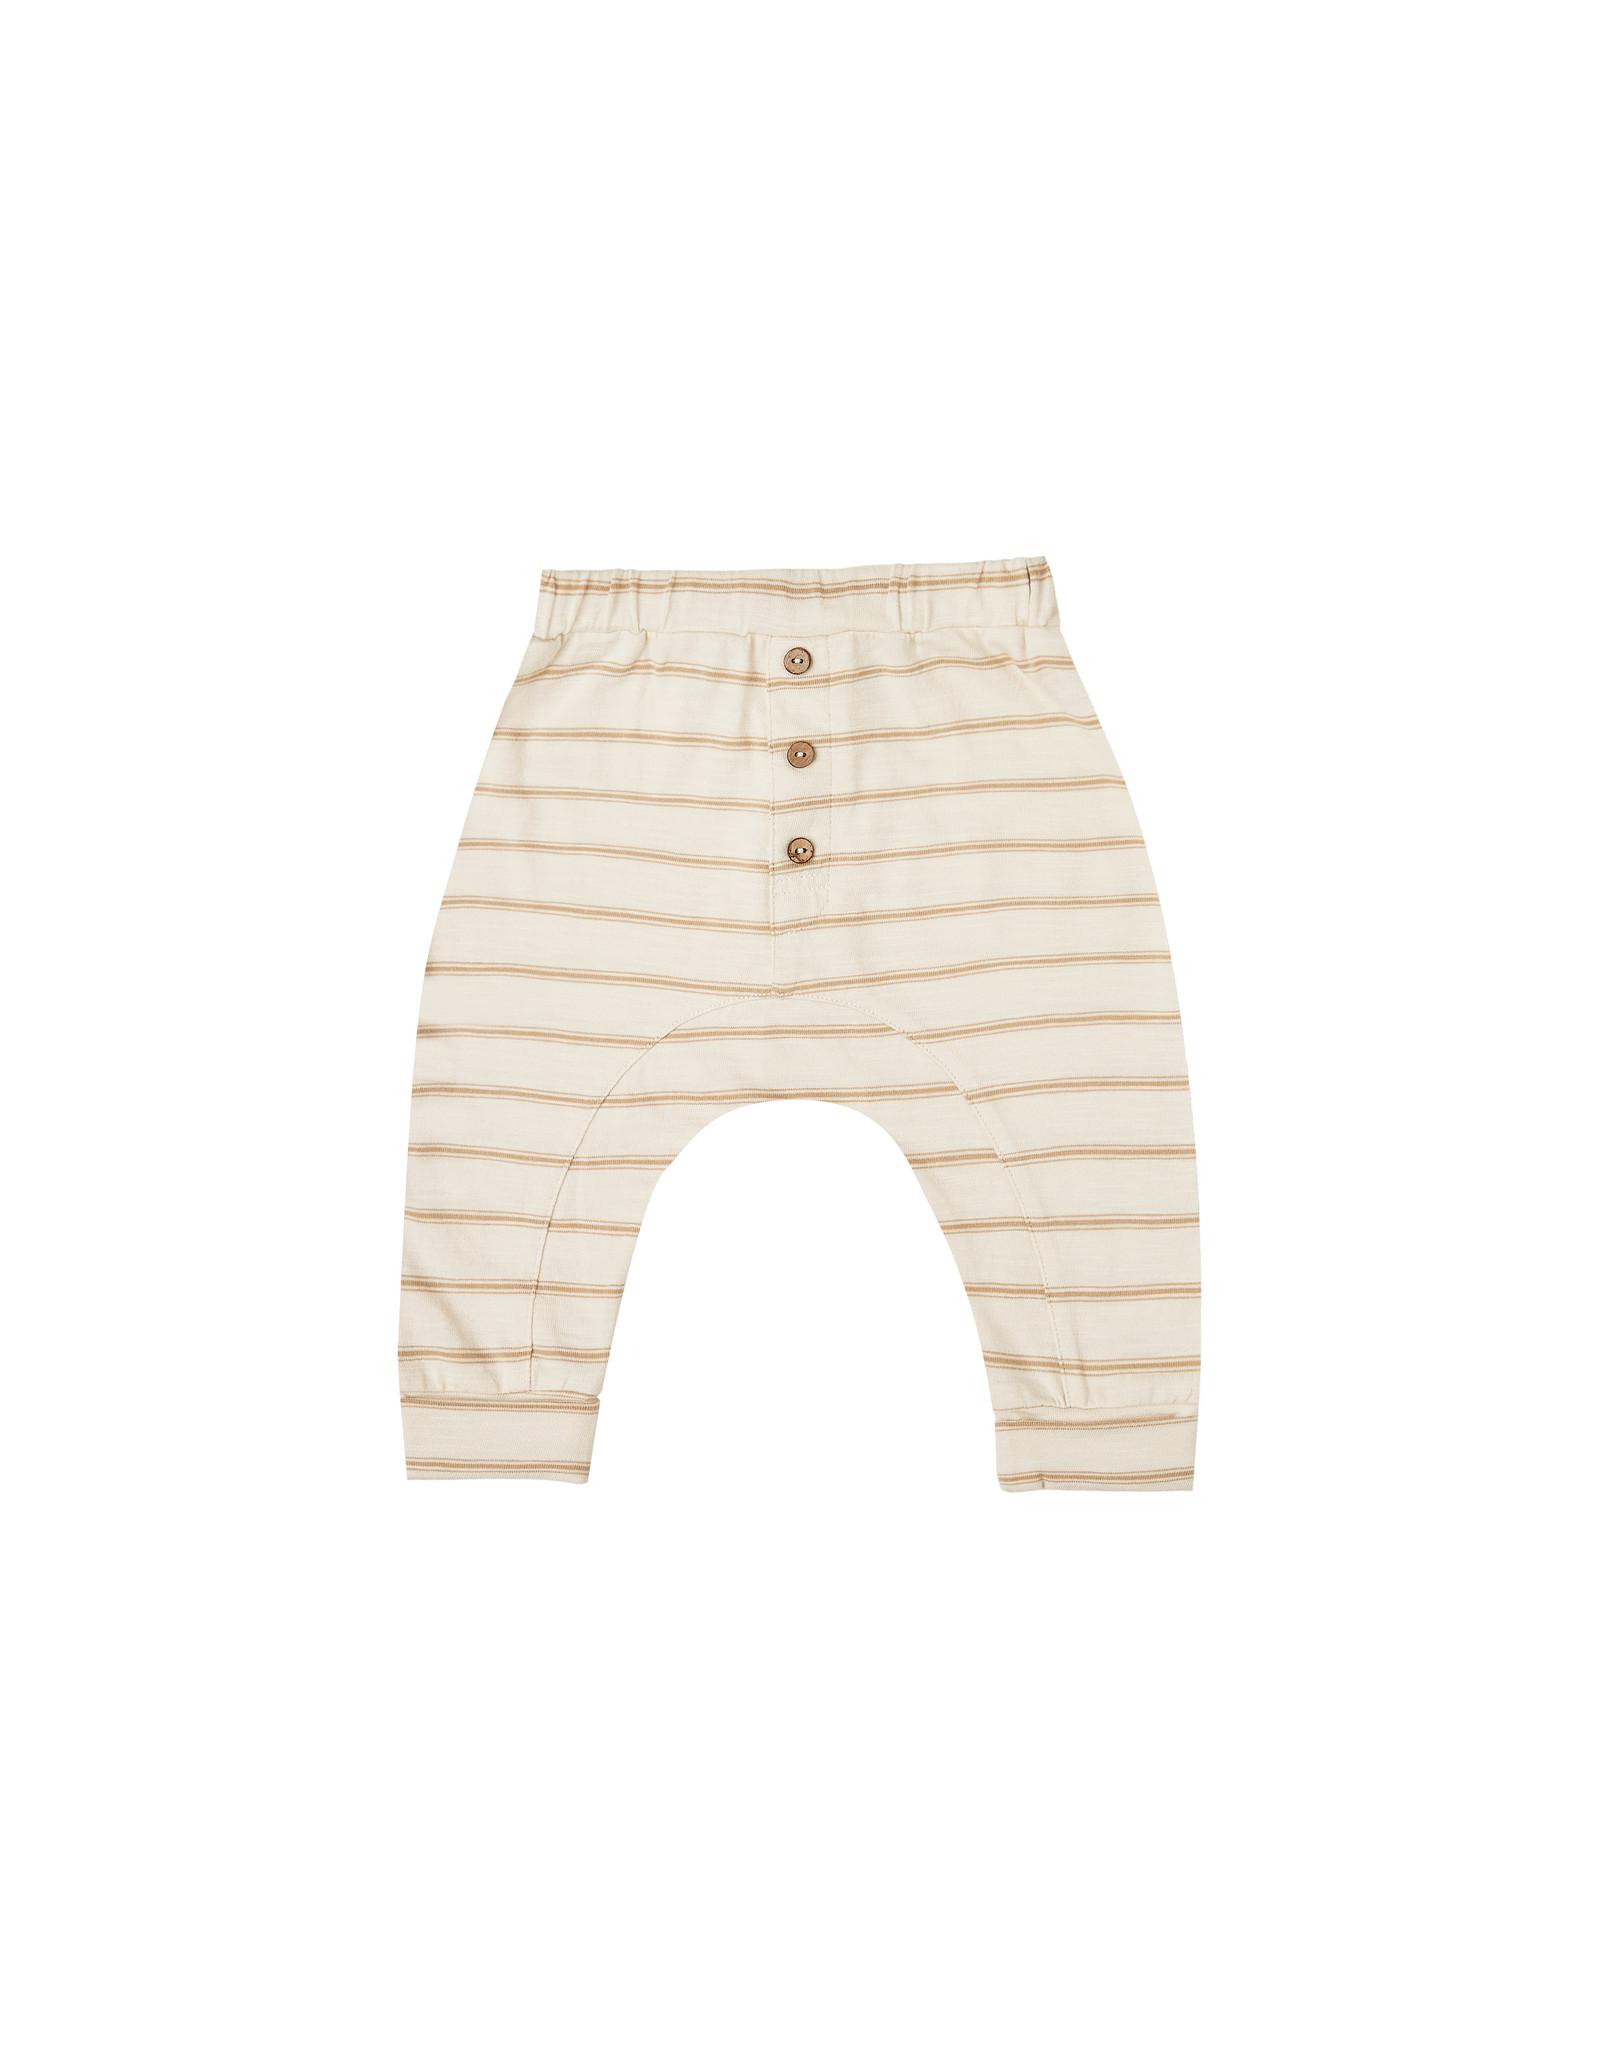 Rylee + Cru Striped Slub Pant